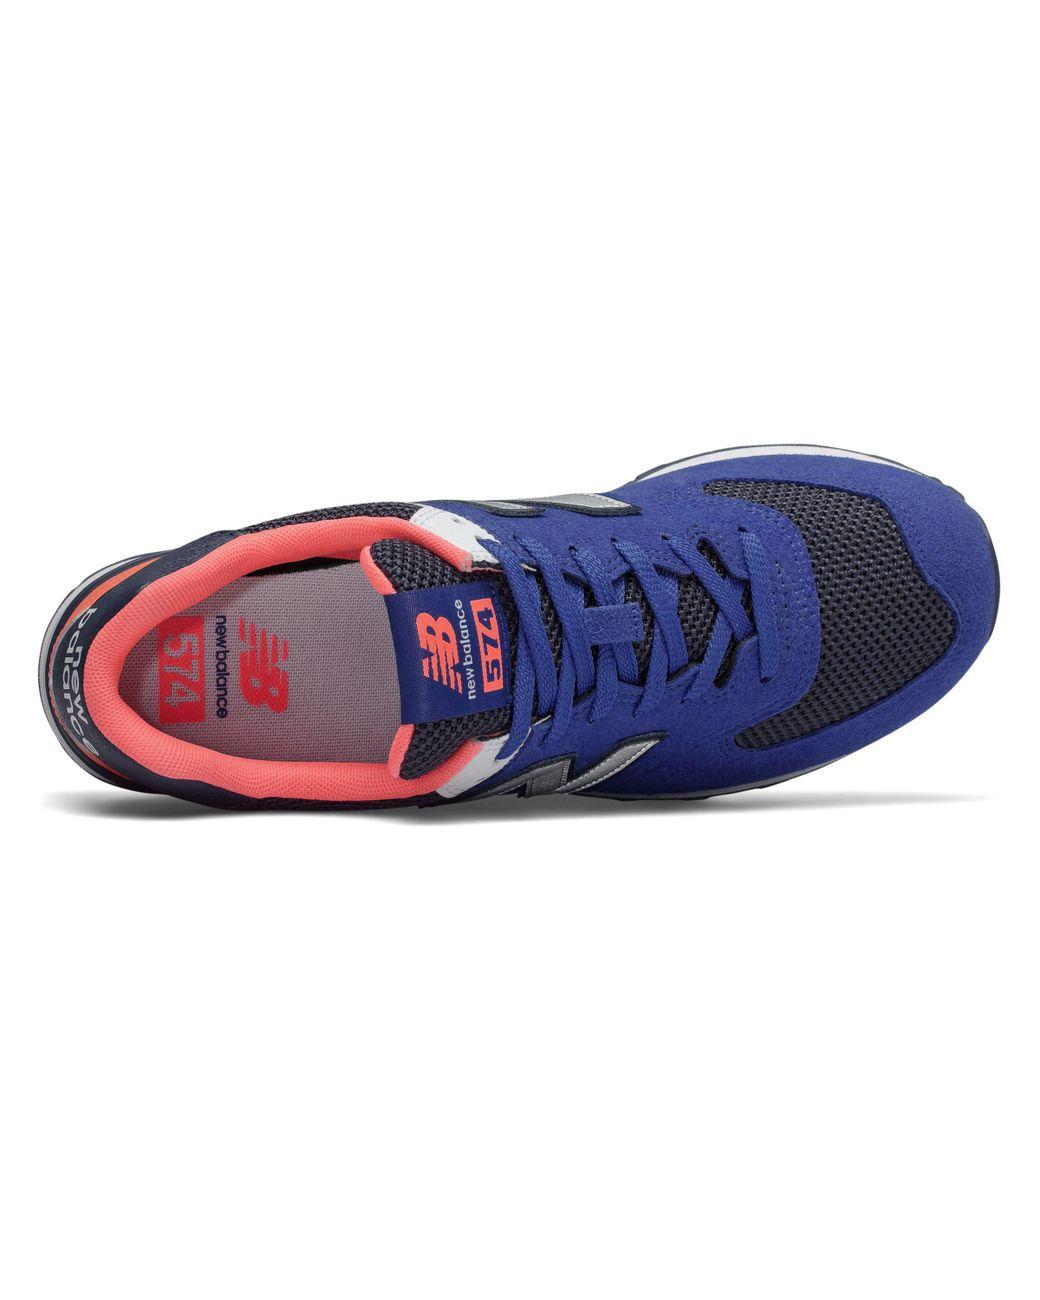 Men's Blue 574 Pebbled Sport